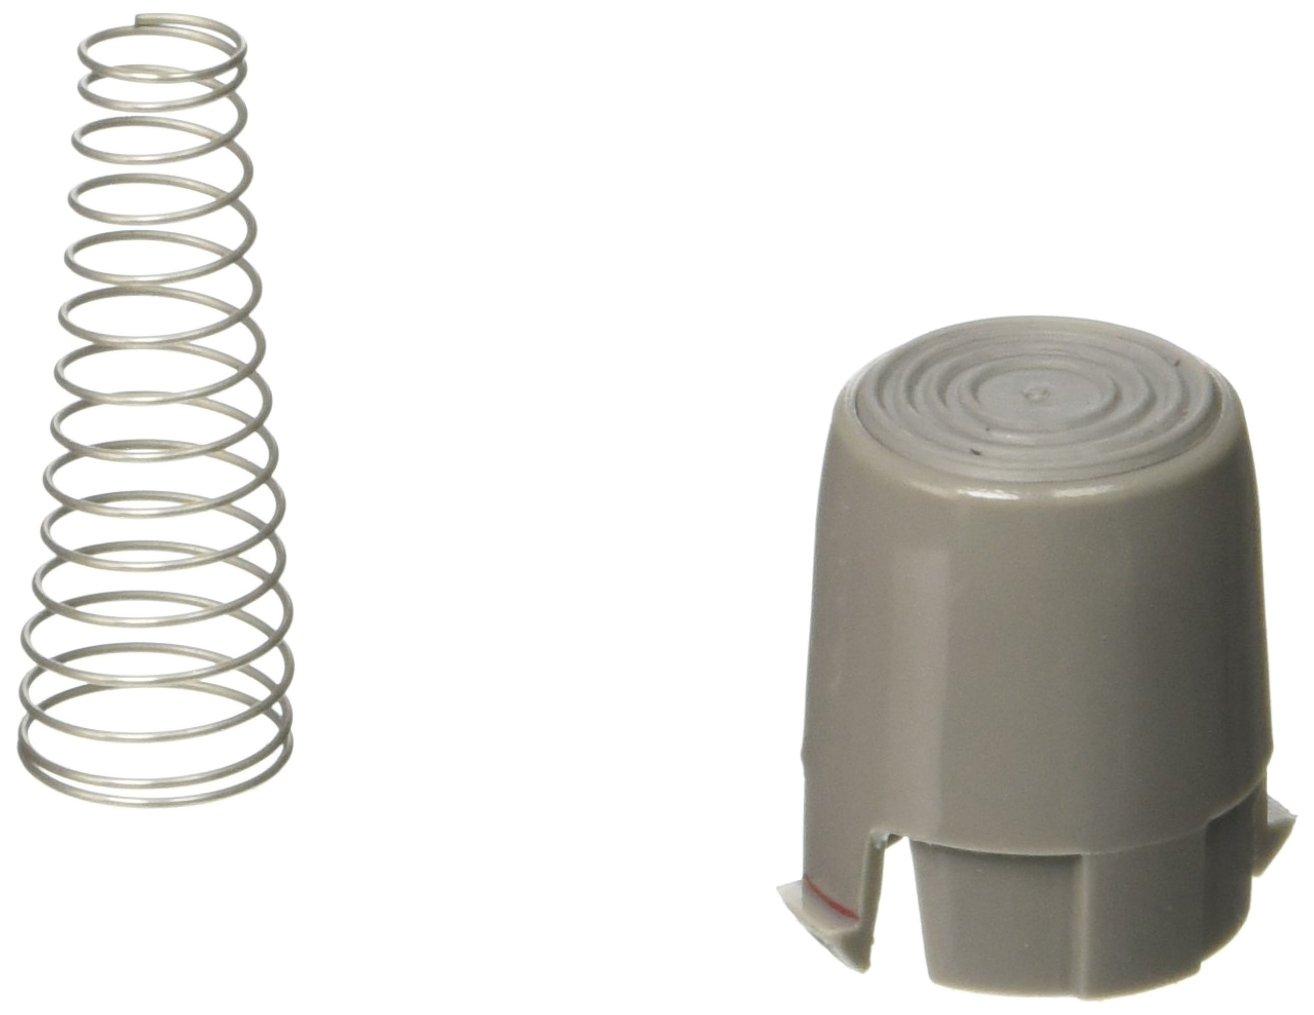 Kenmore Agm73610701 Magnet Home Improvement Parts Diagram List For Model 59677599802 Kenmoreeliteparts